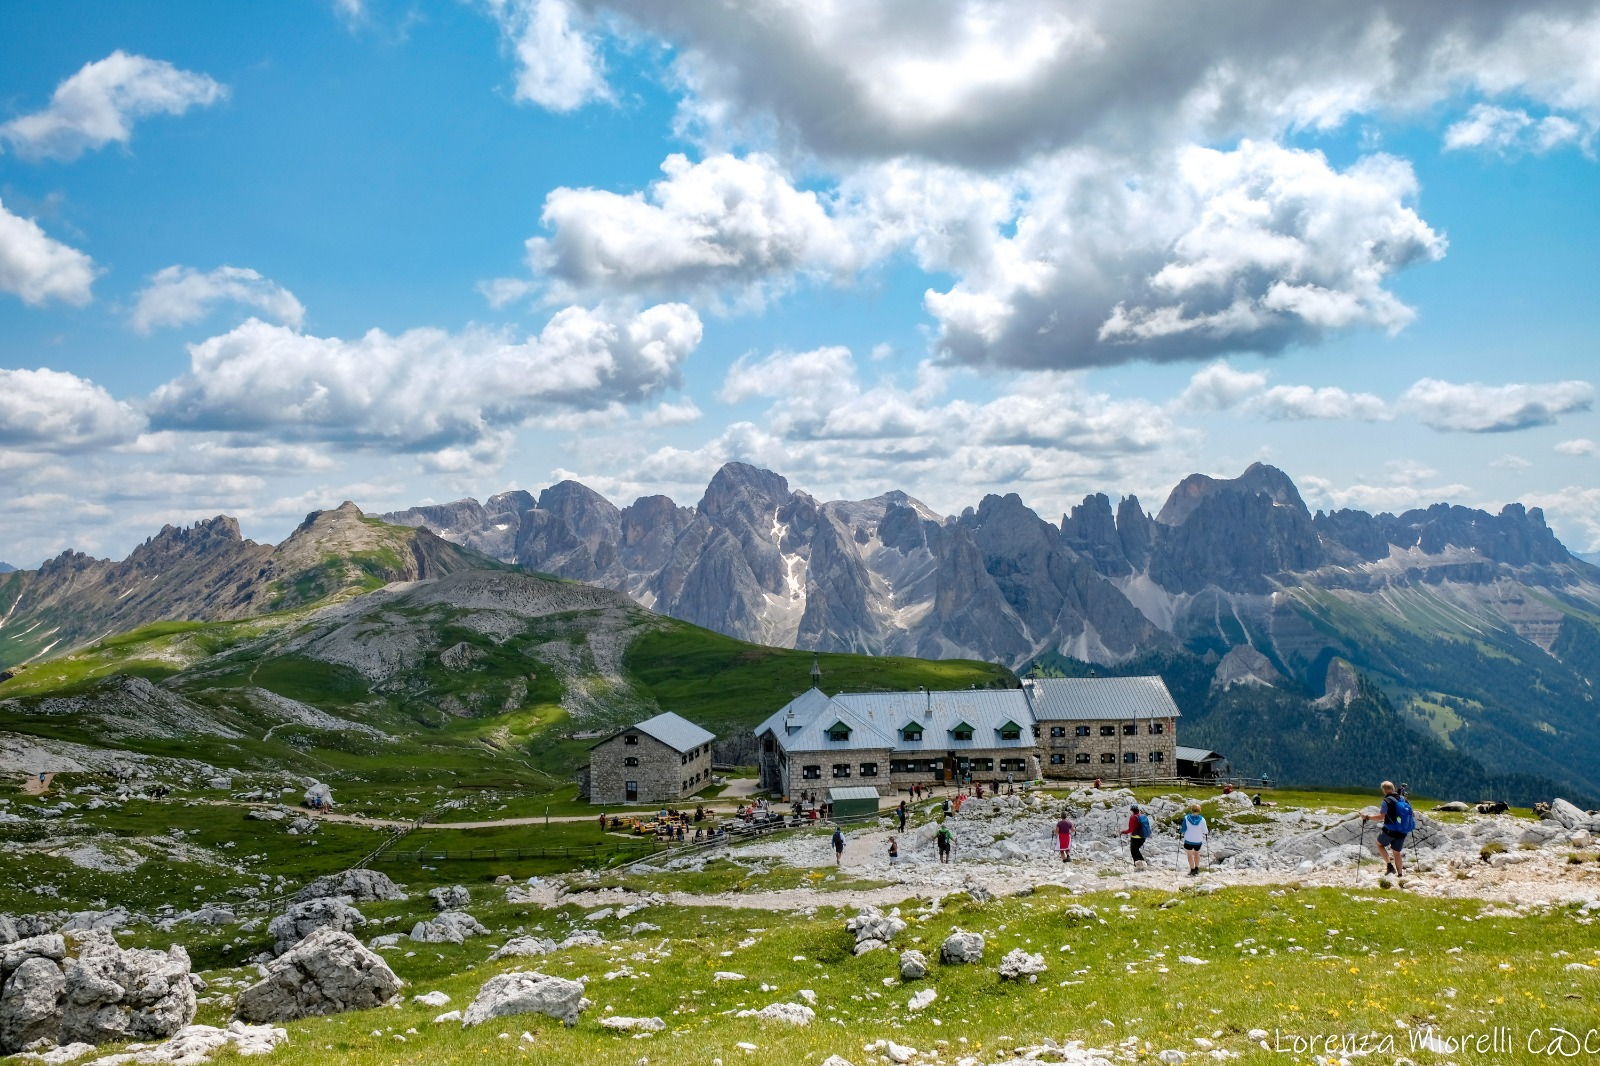 Rifugio Bolzano - Alpe di Siusi